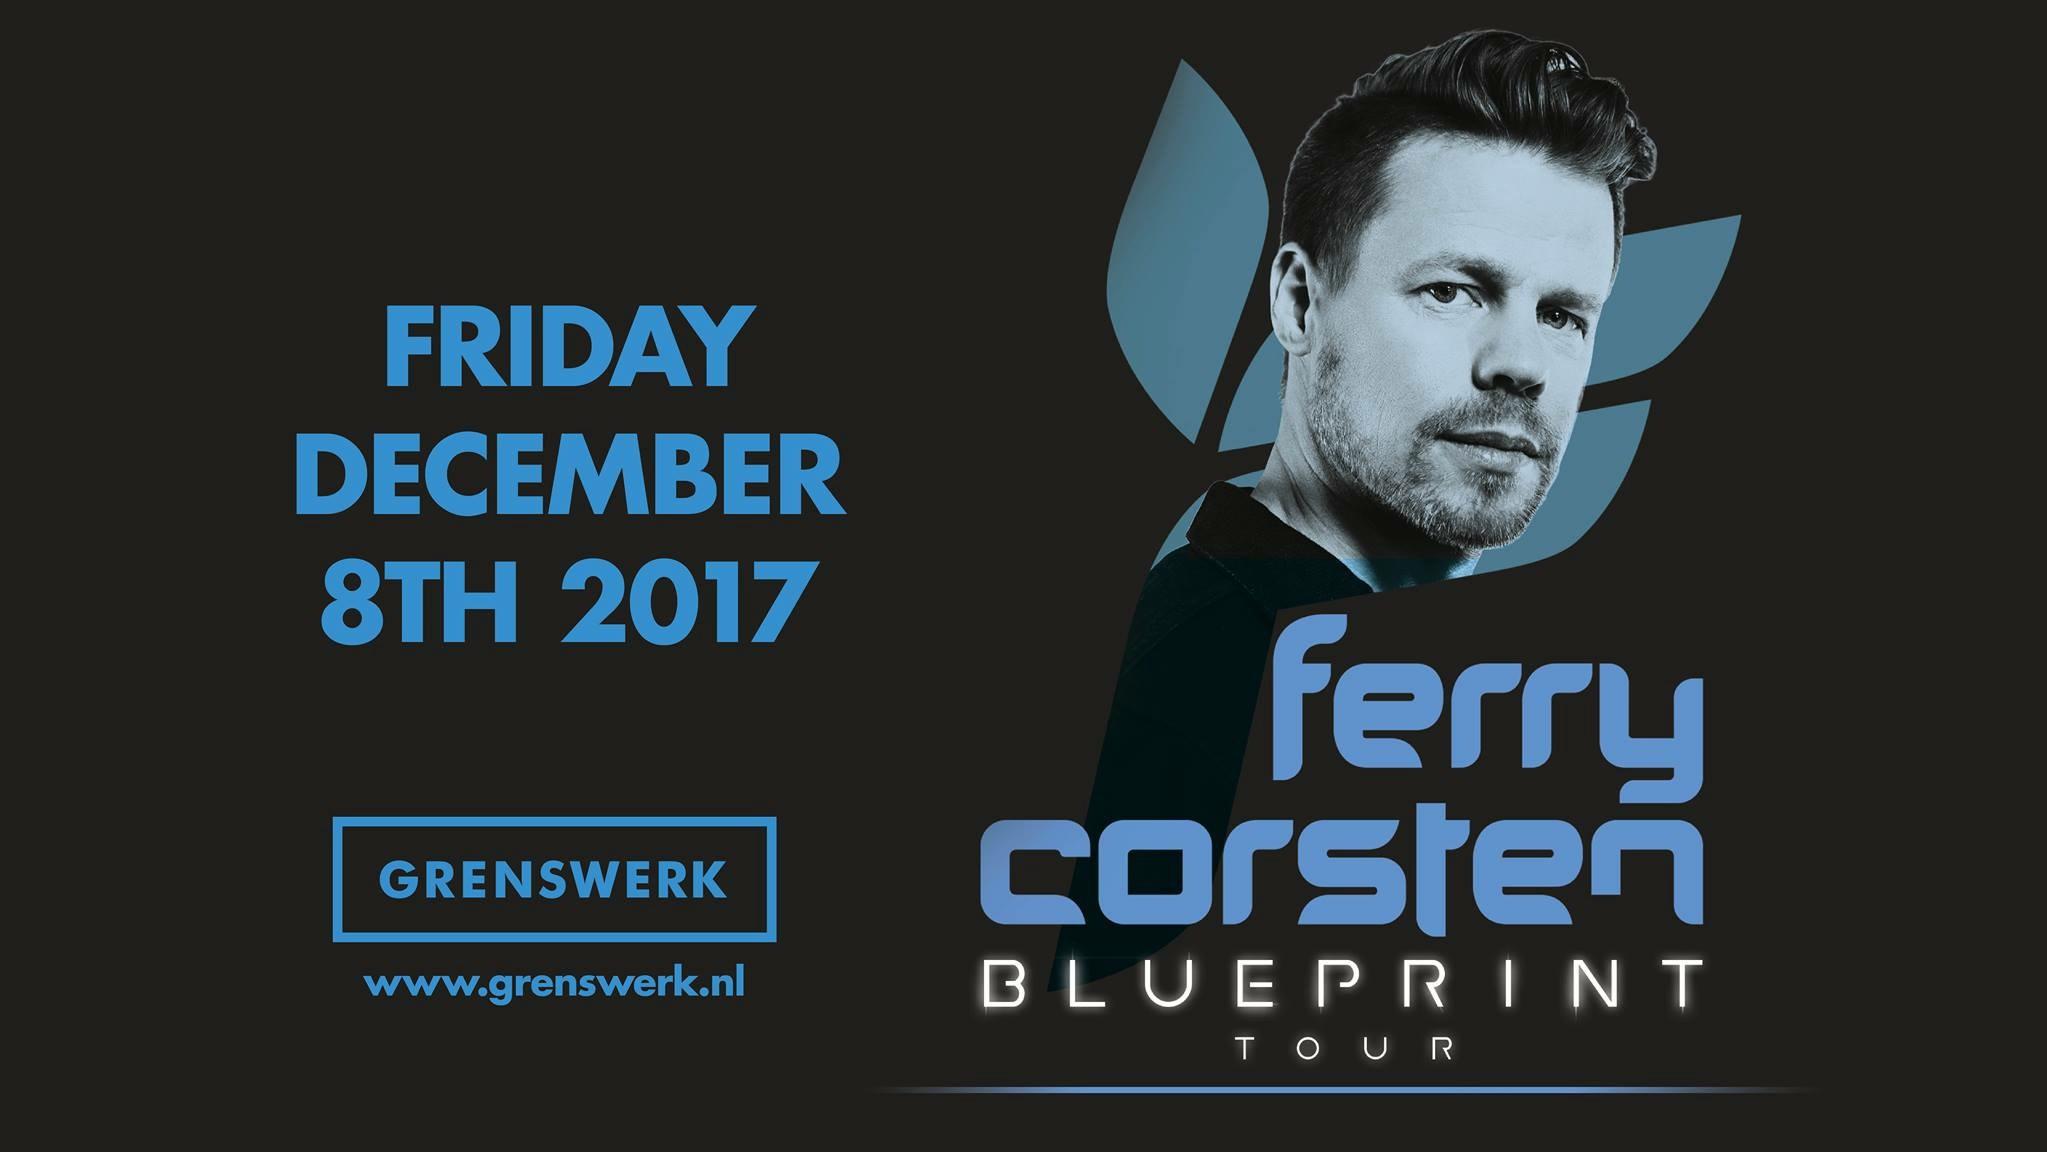 Ferry Corsten Blueprint Album Tour